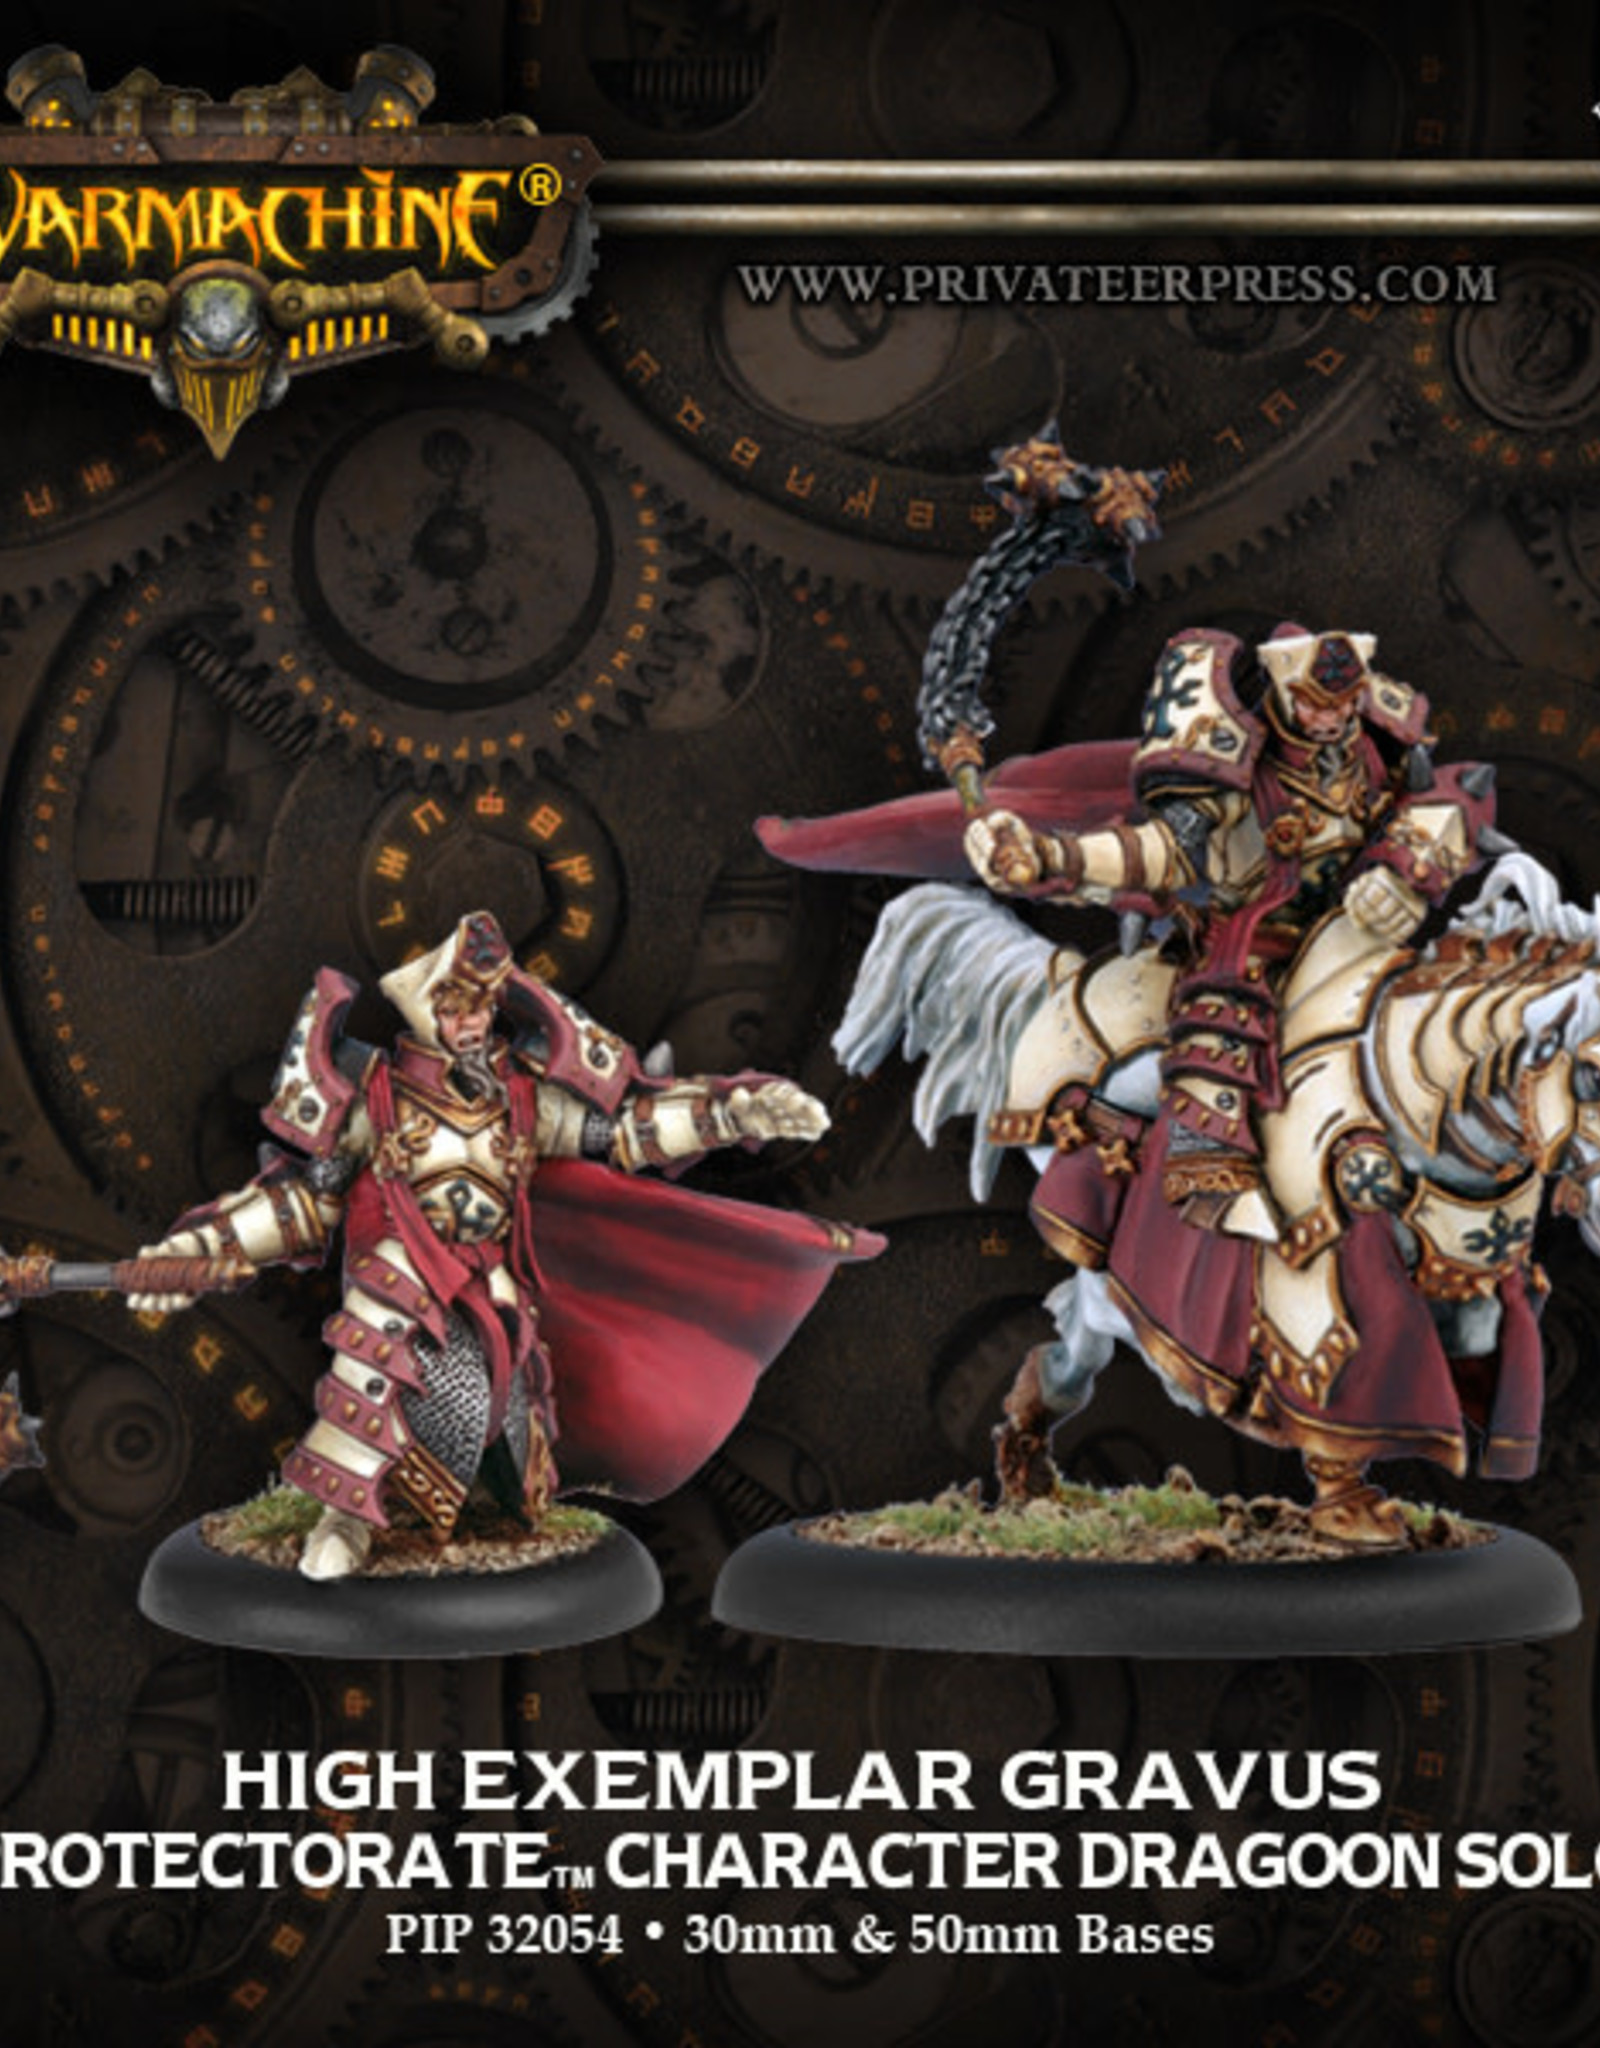 Warmachine Protectorate - High Exemplar Gravus